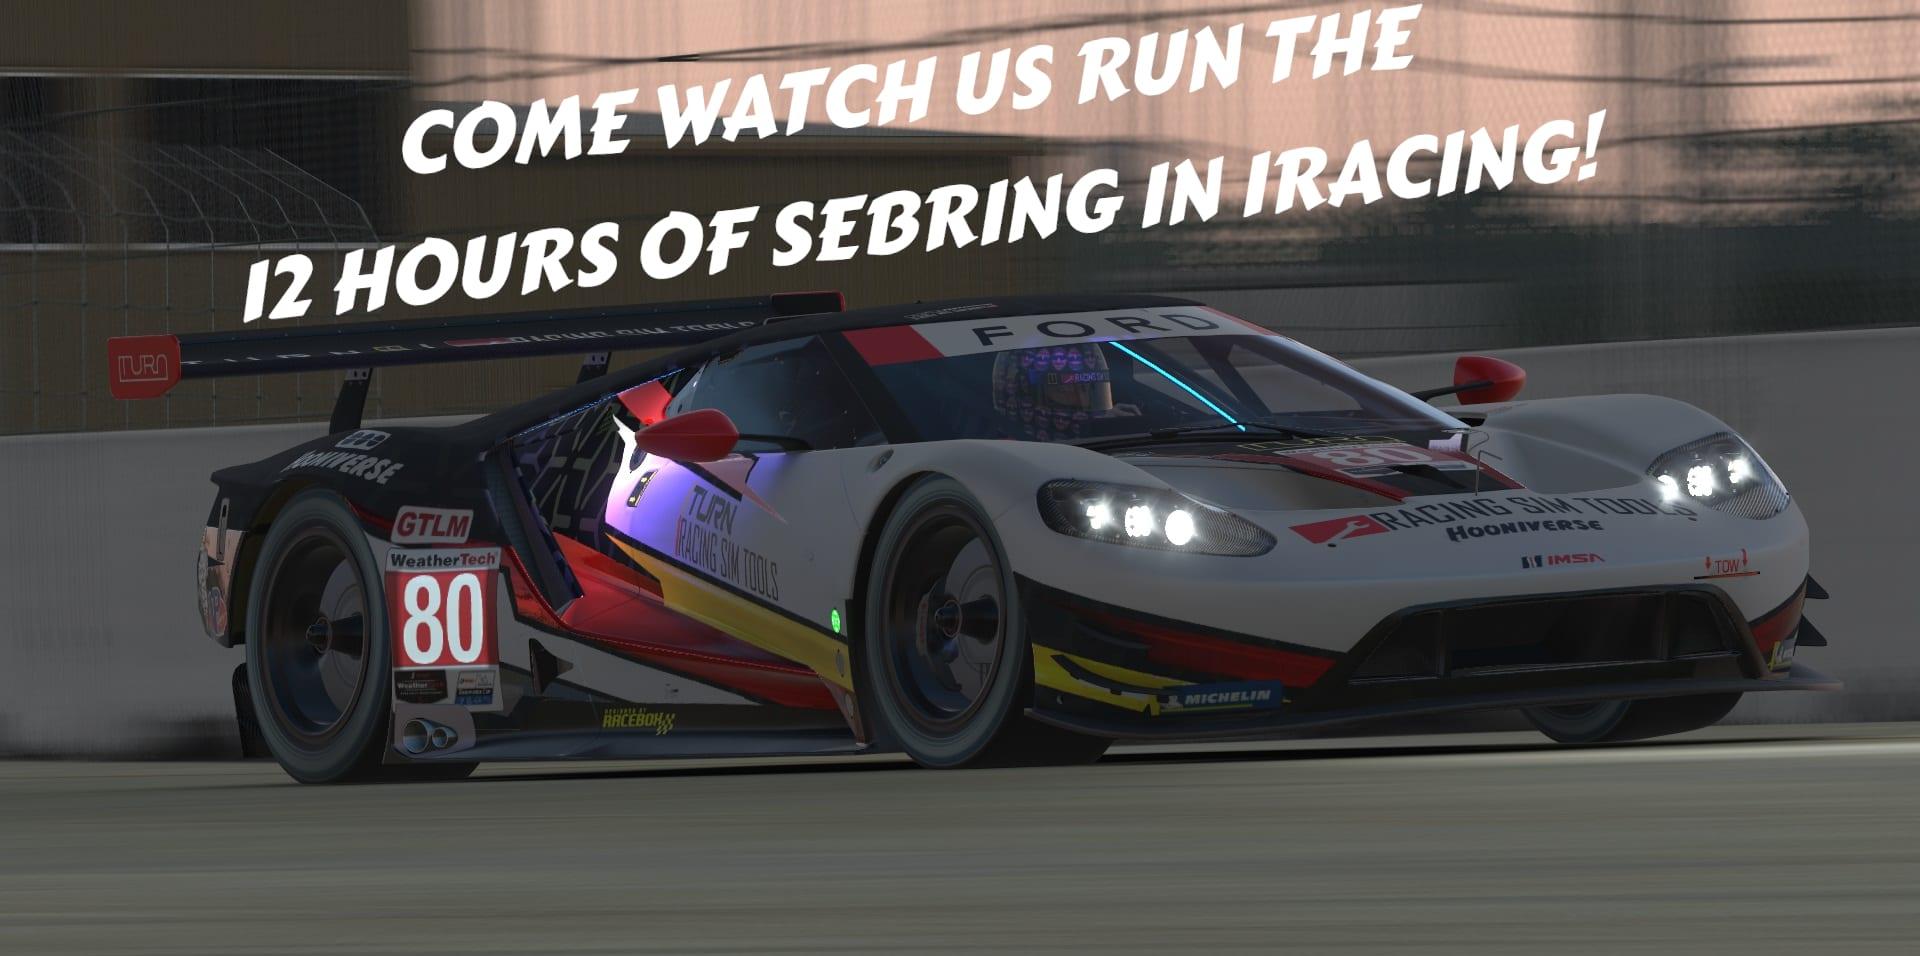 iracing sebring teaser